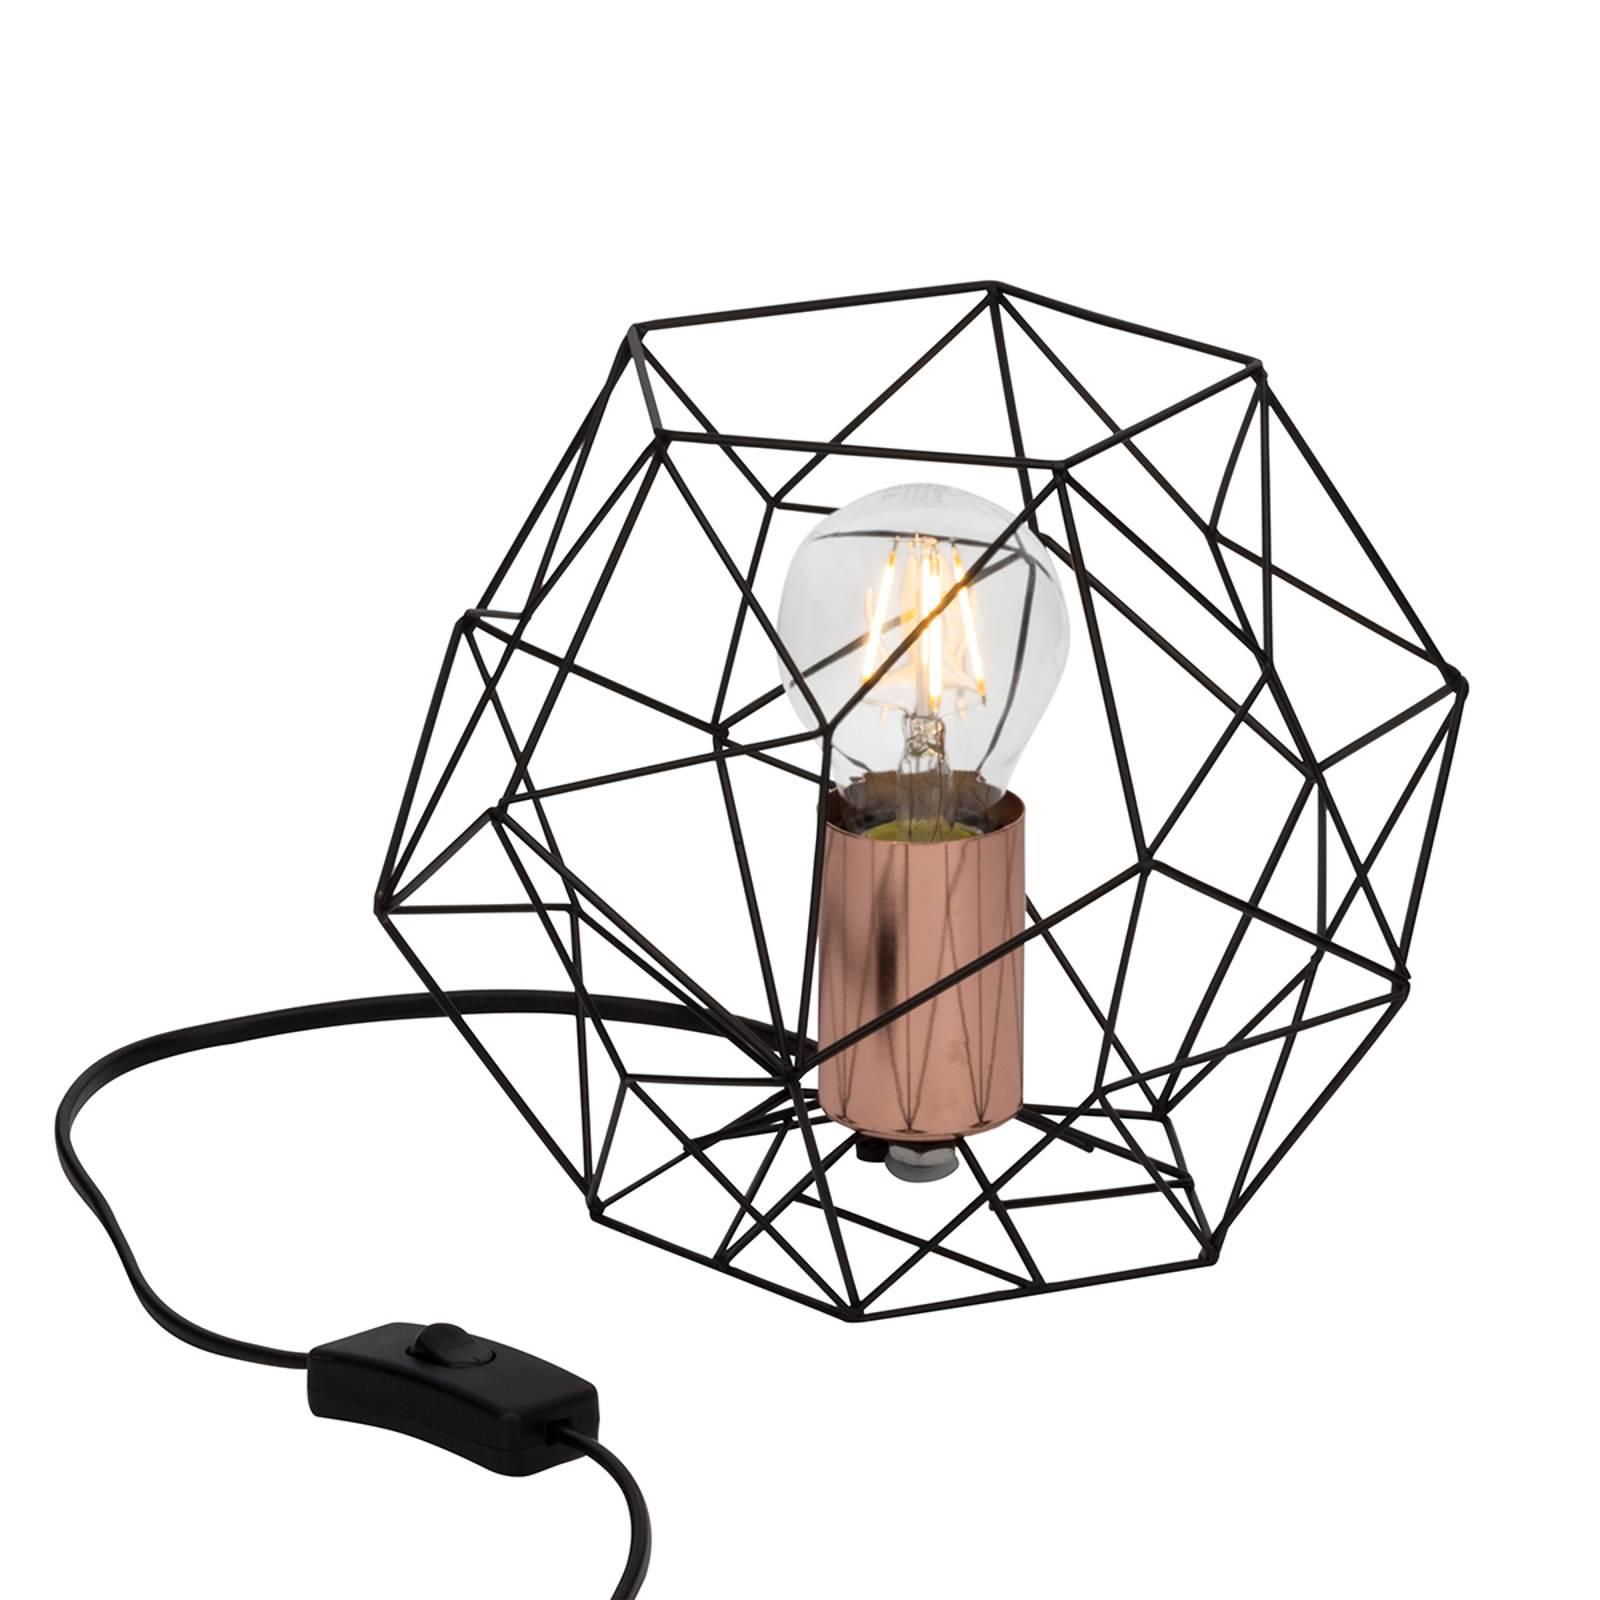 Synergy - Interessant uitgeruste tafellamp